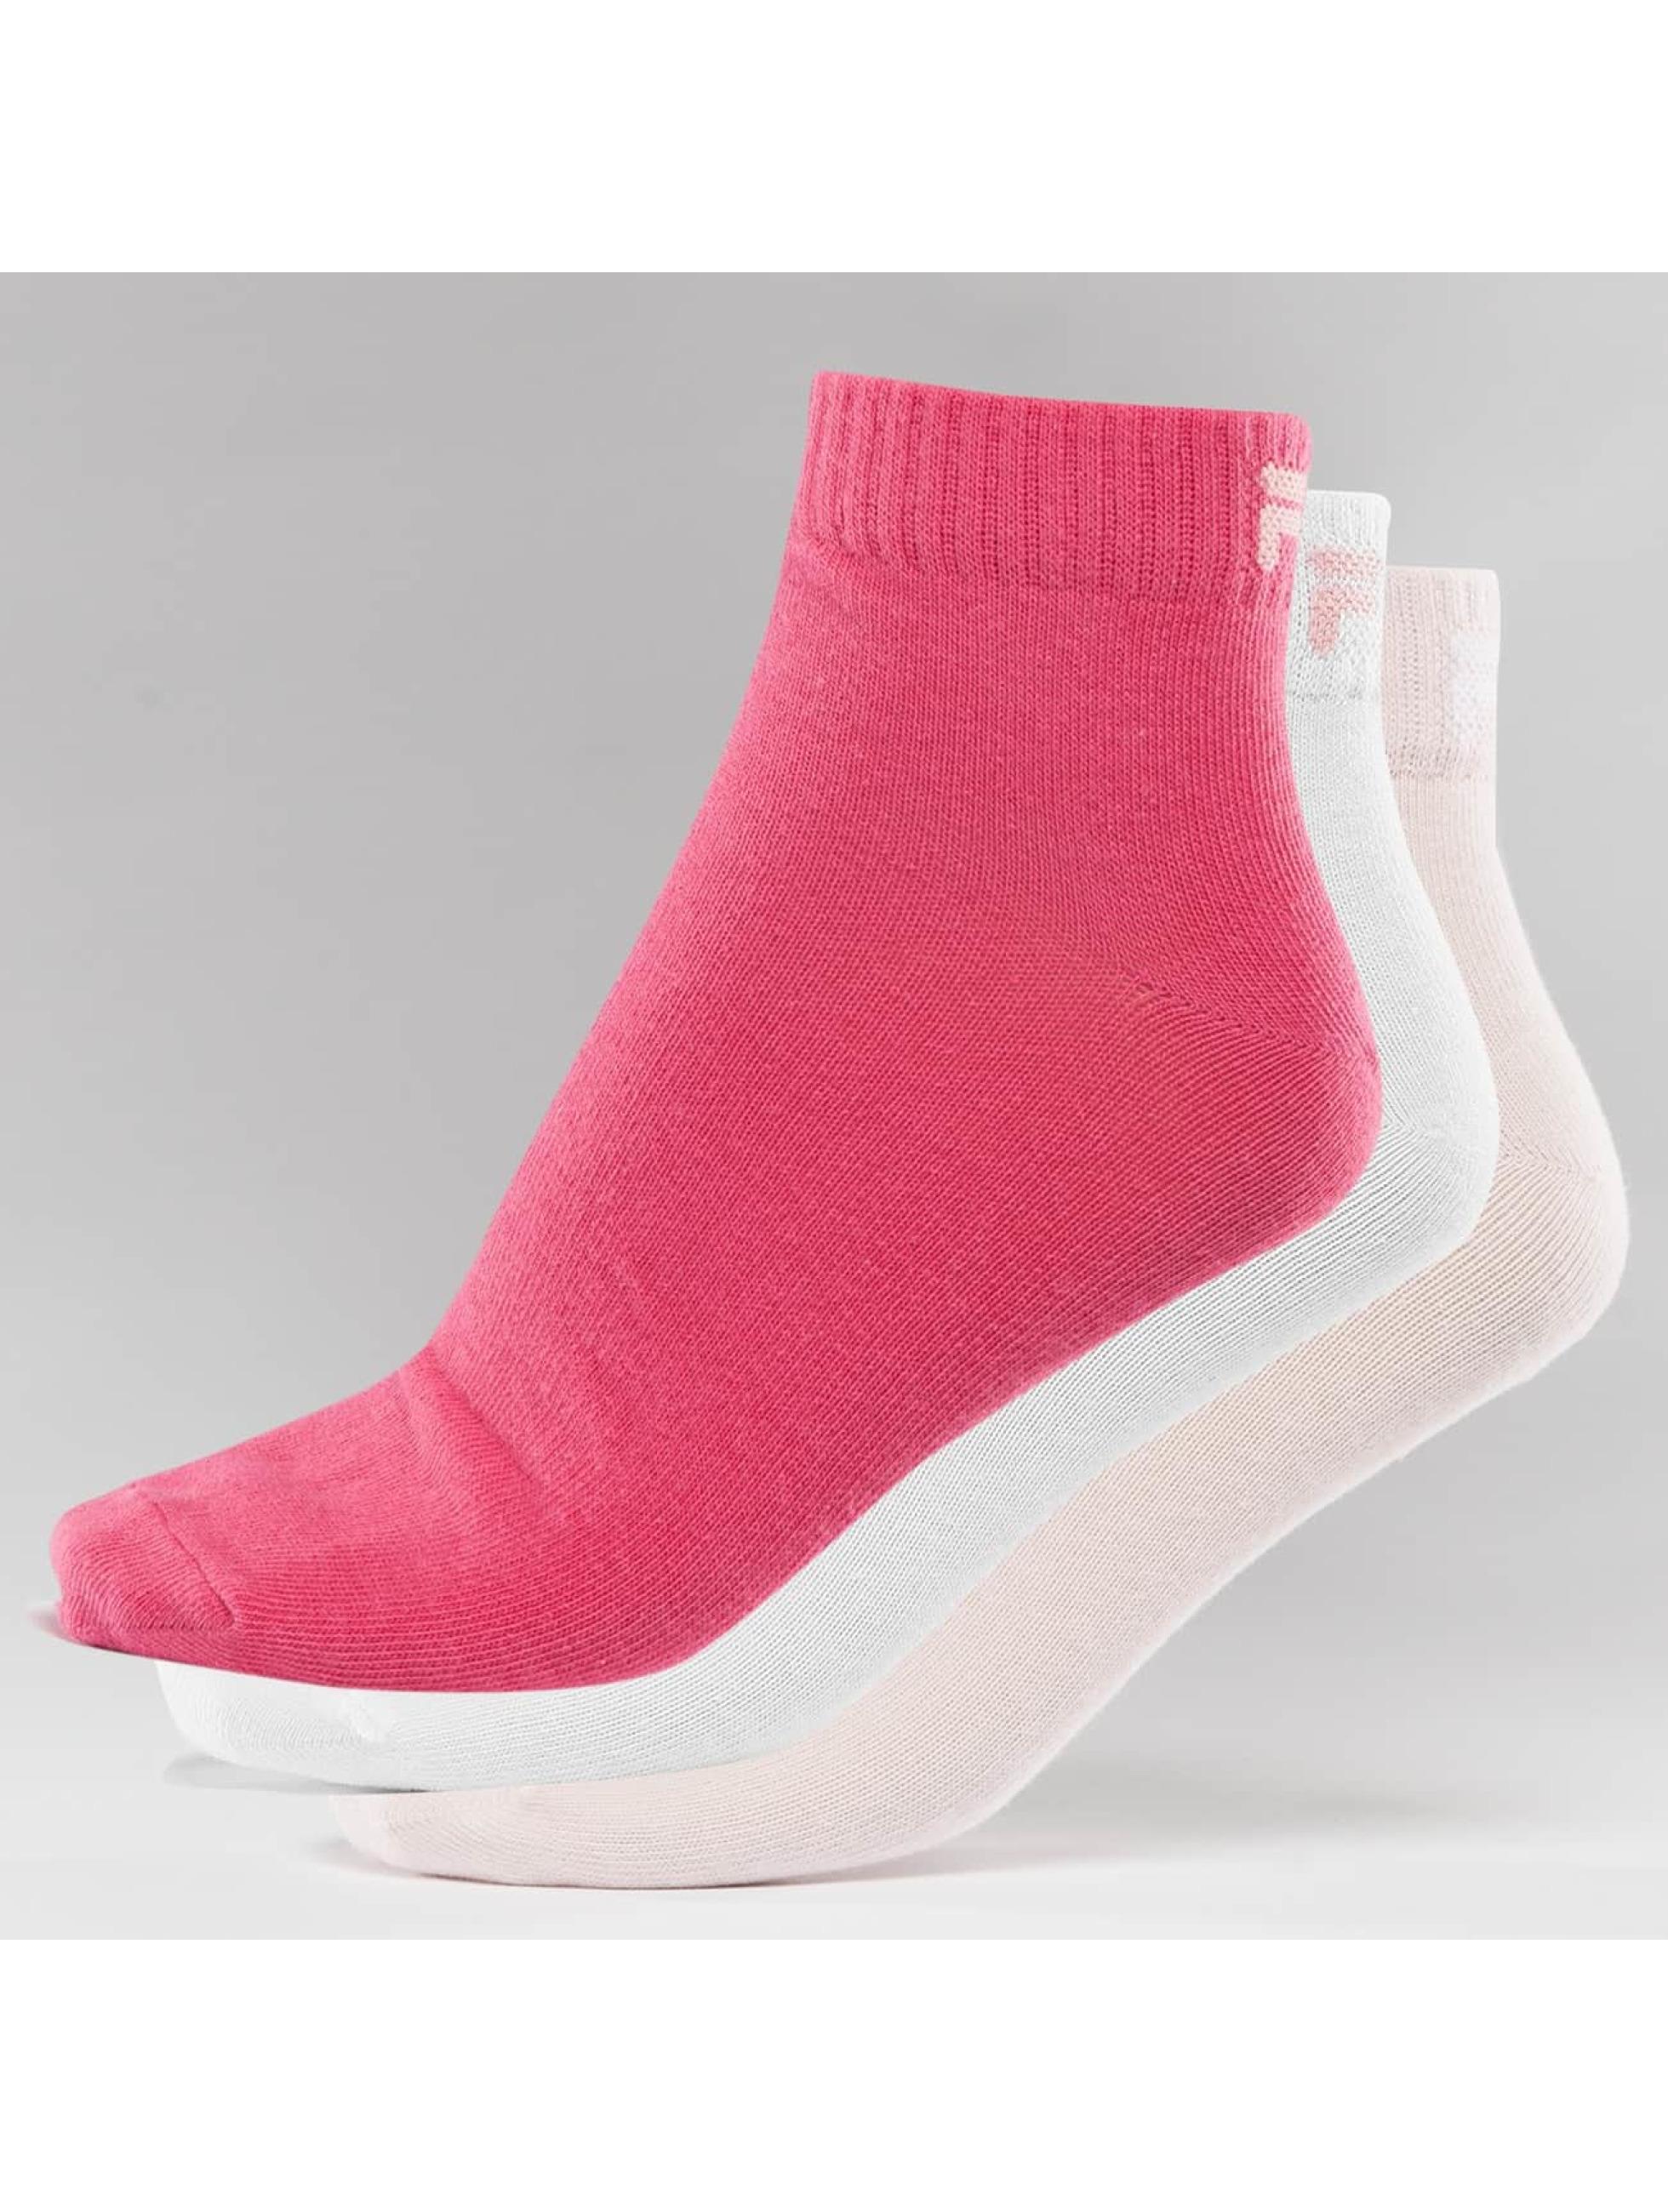 FILA Calzino 3-Pack rosa